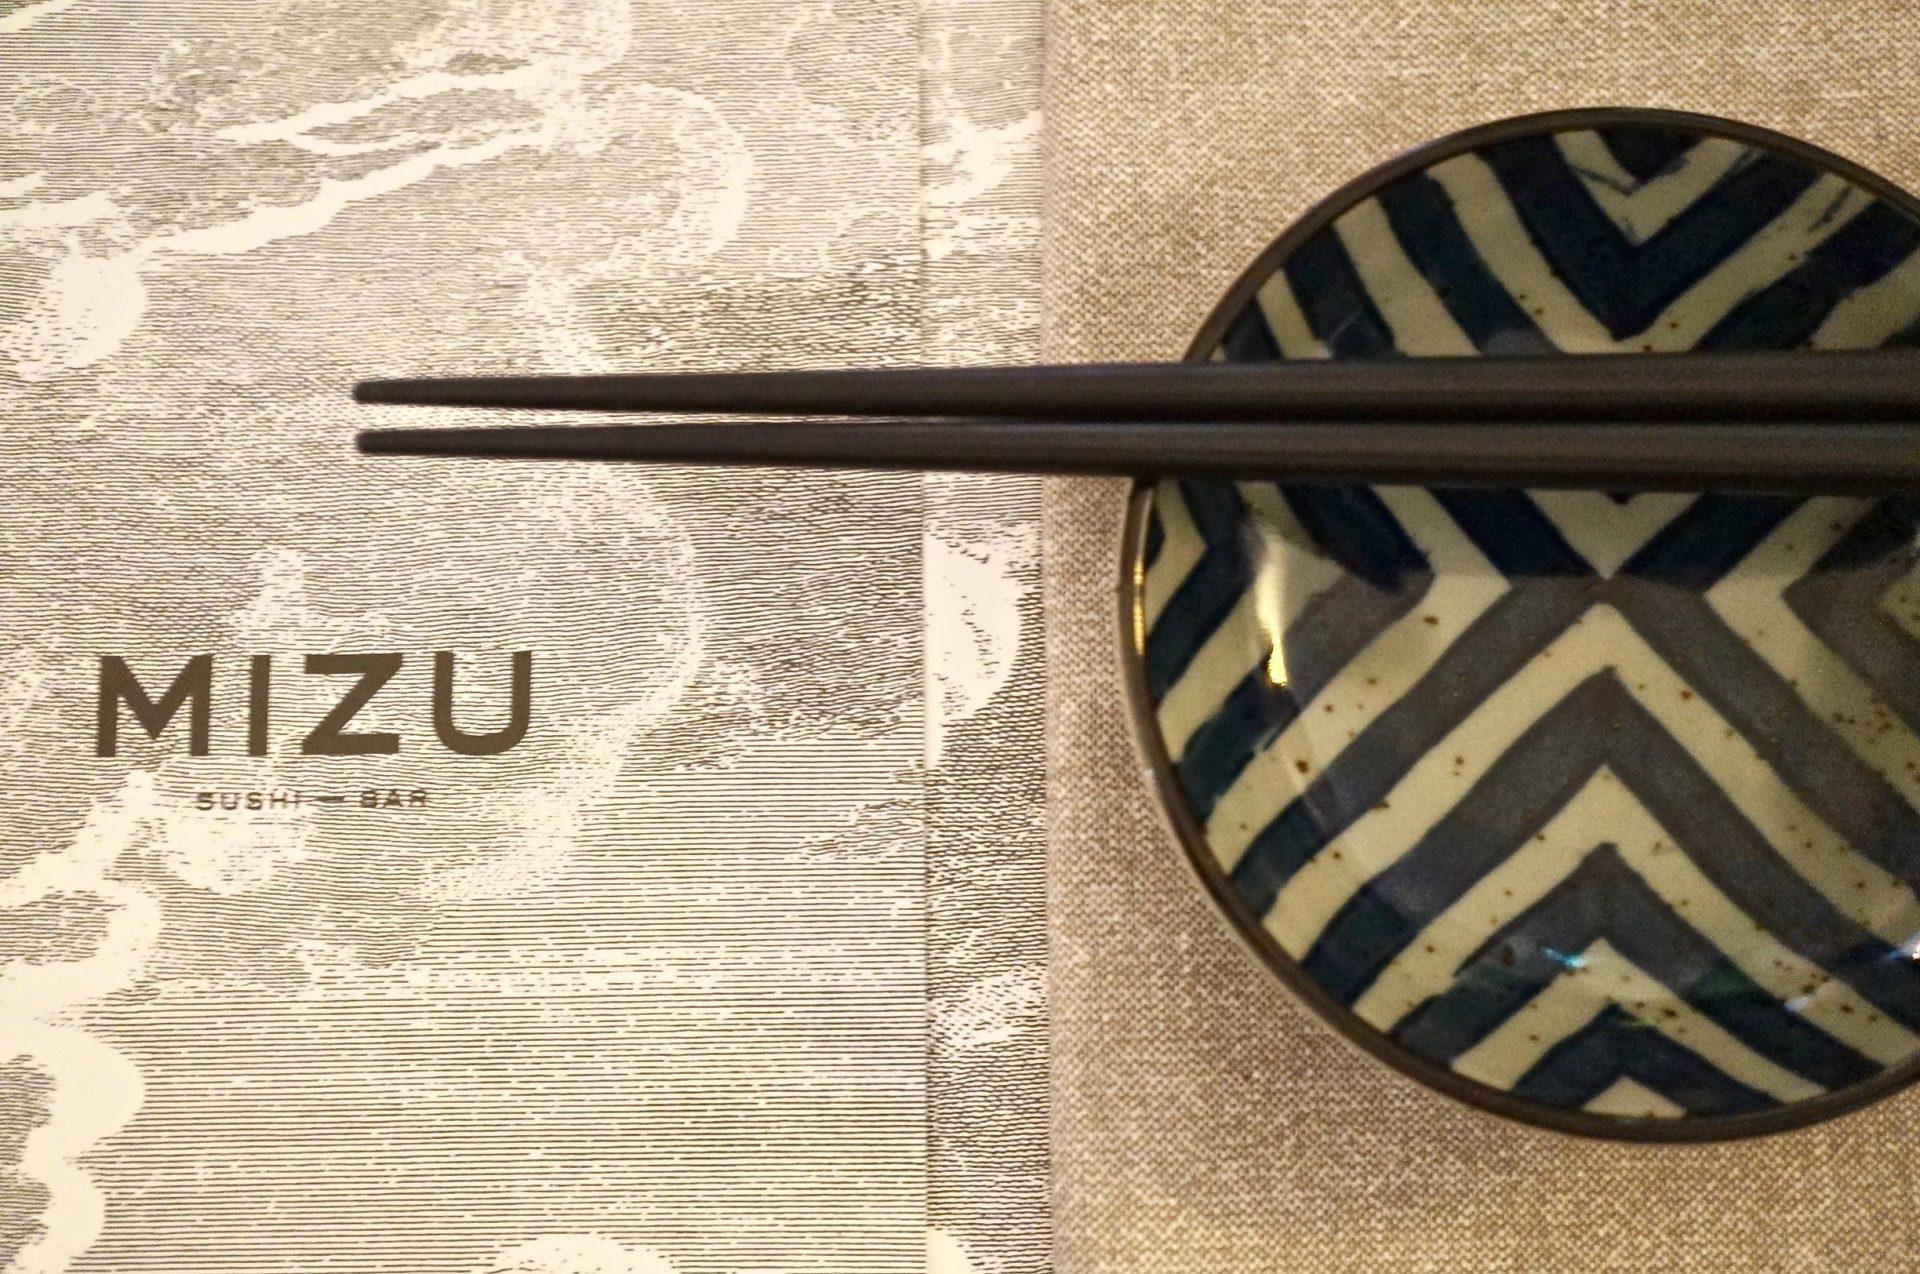 MIZU – Sushi am Tegernsee